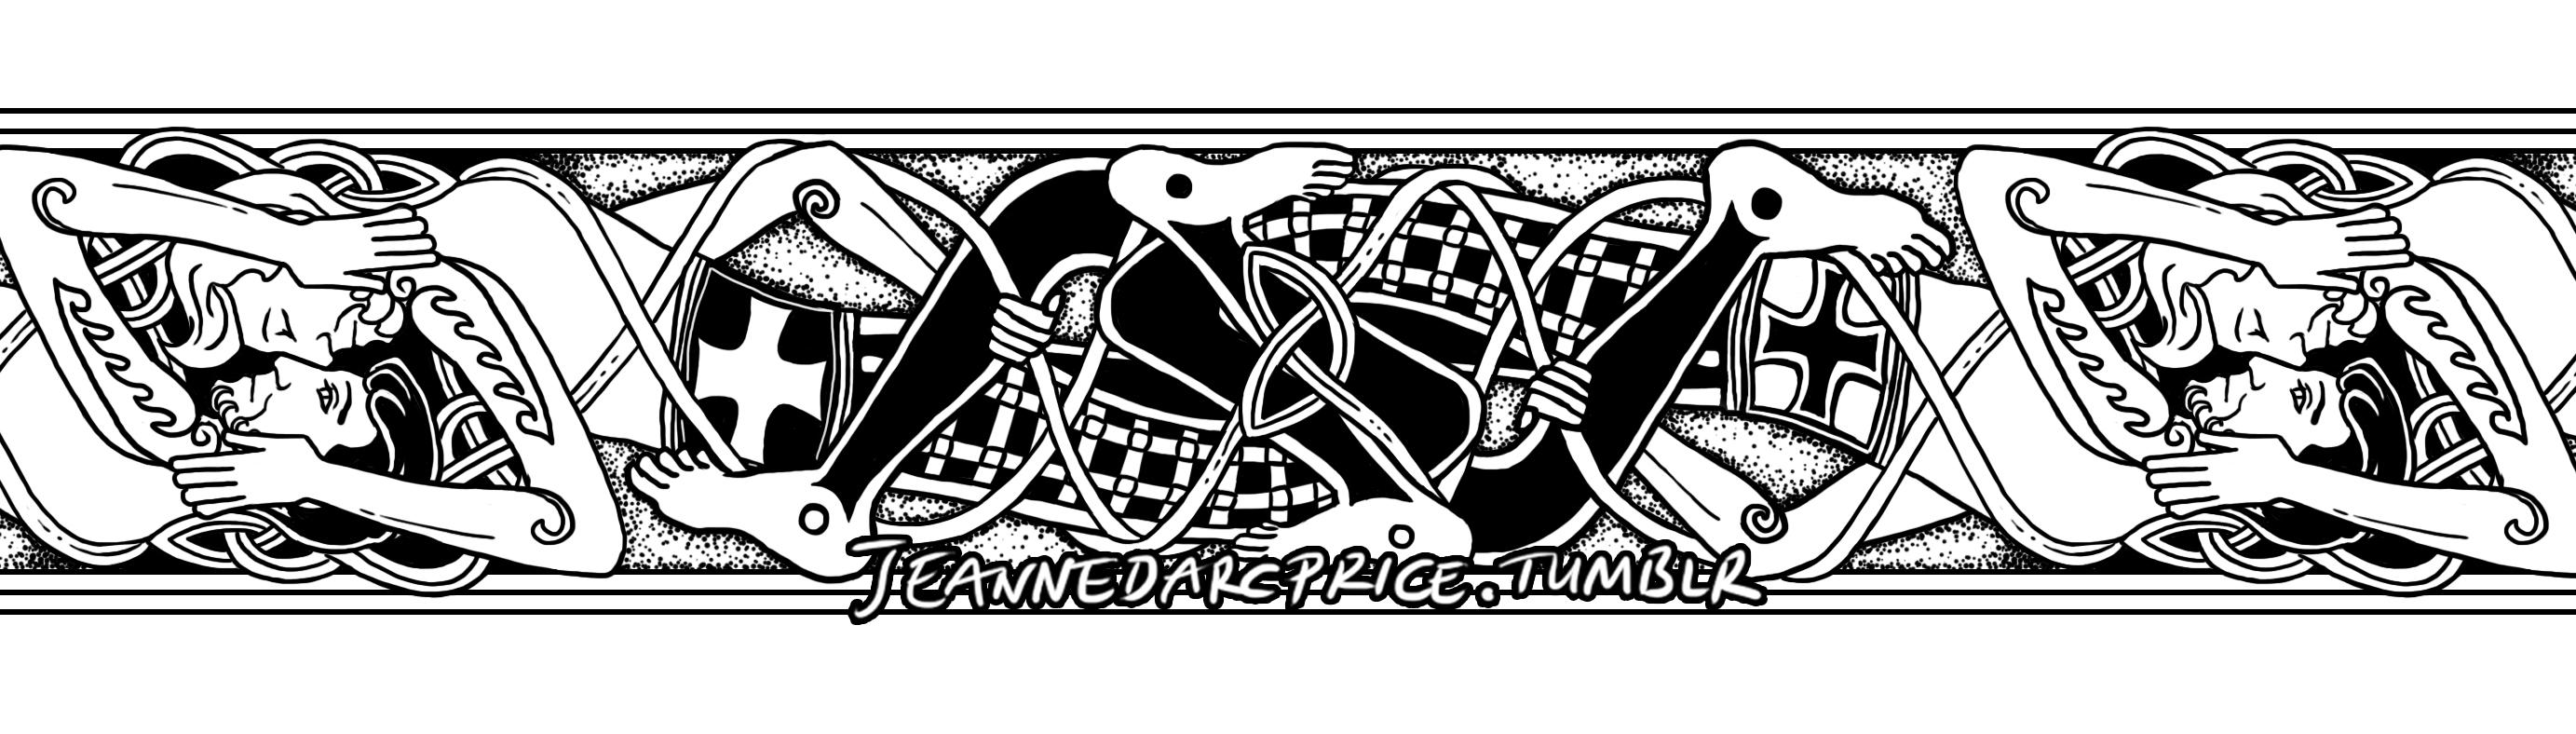 Tattoo band of Celtic design